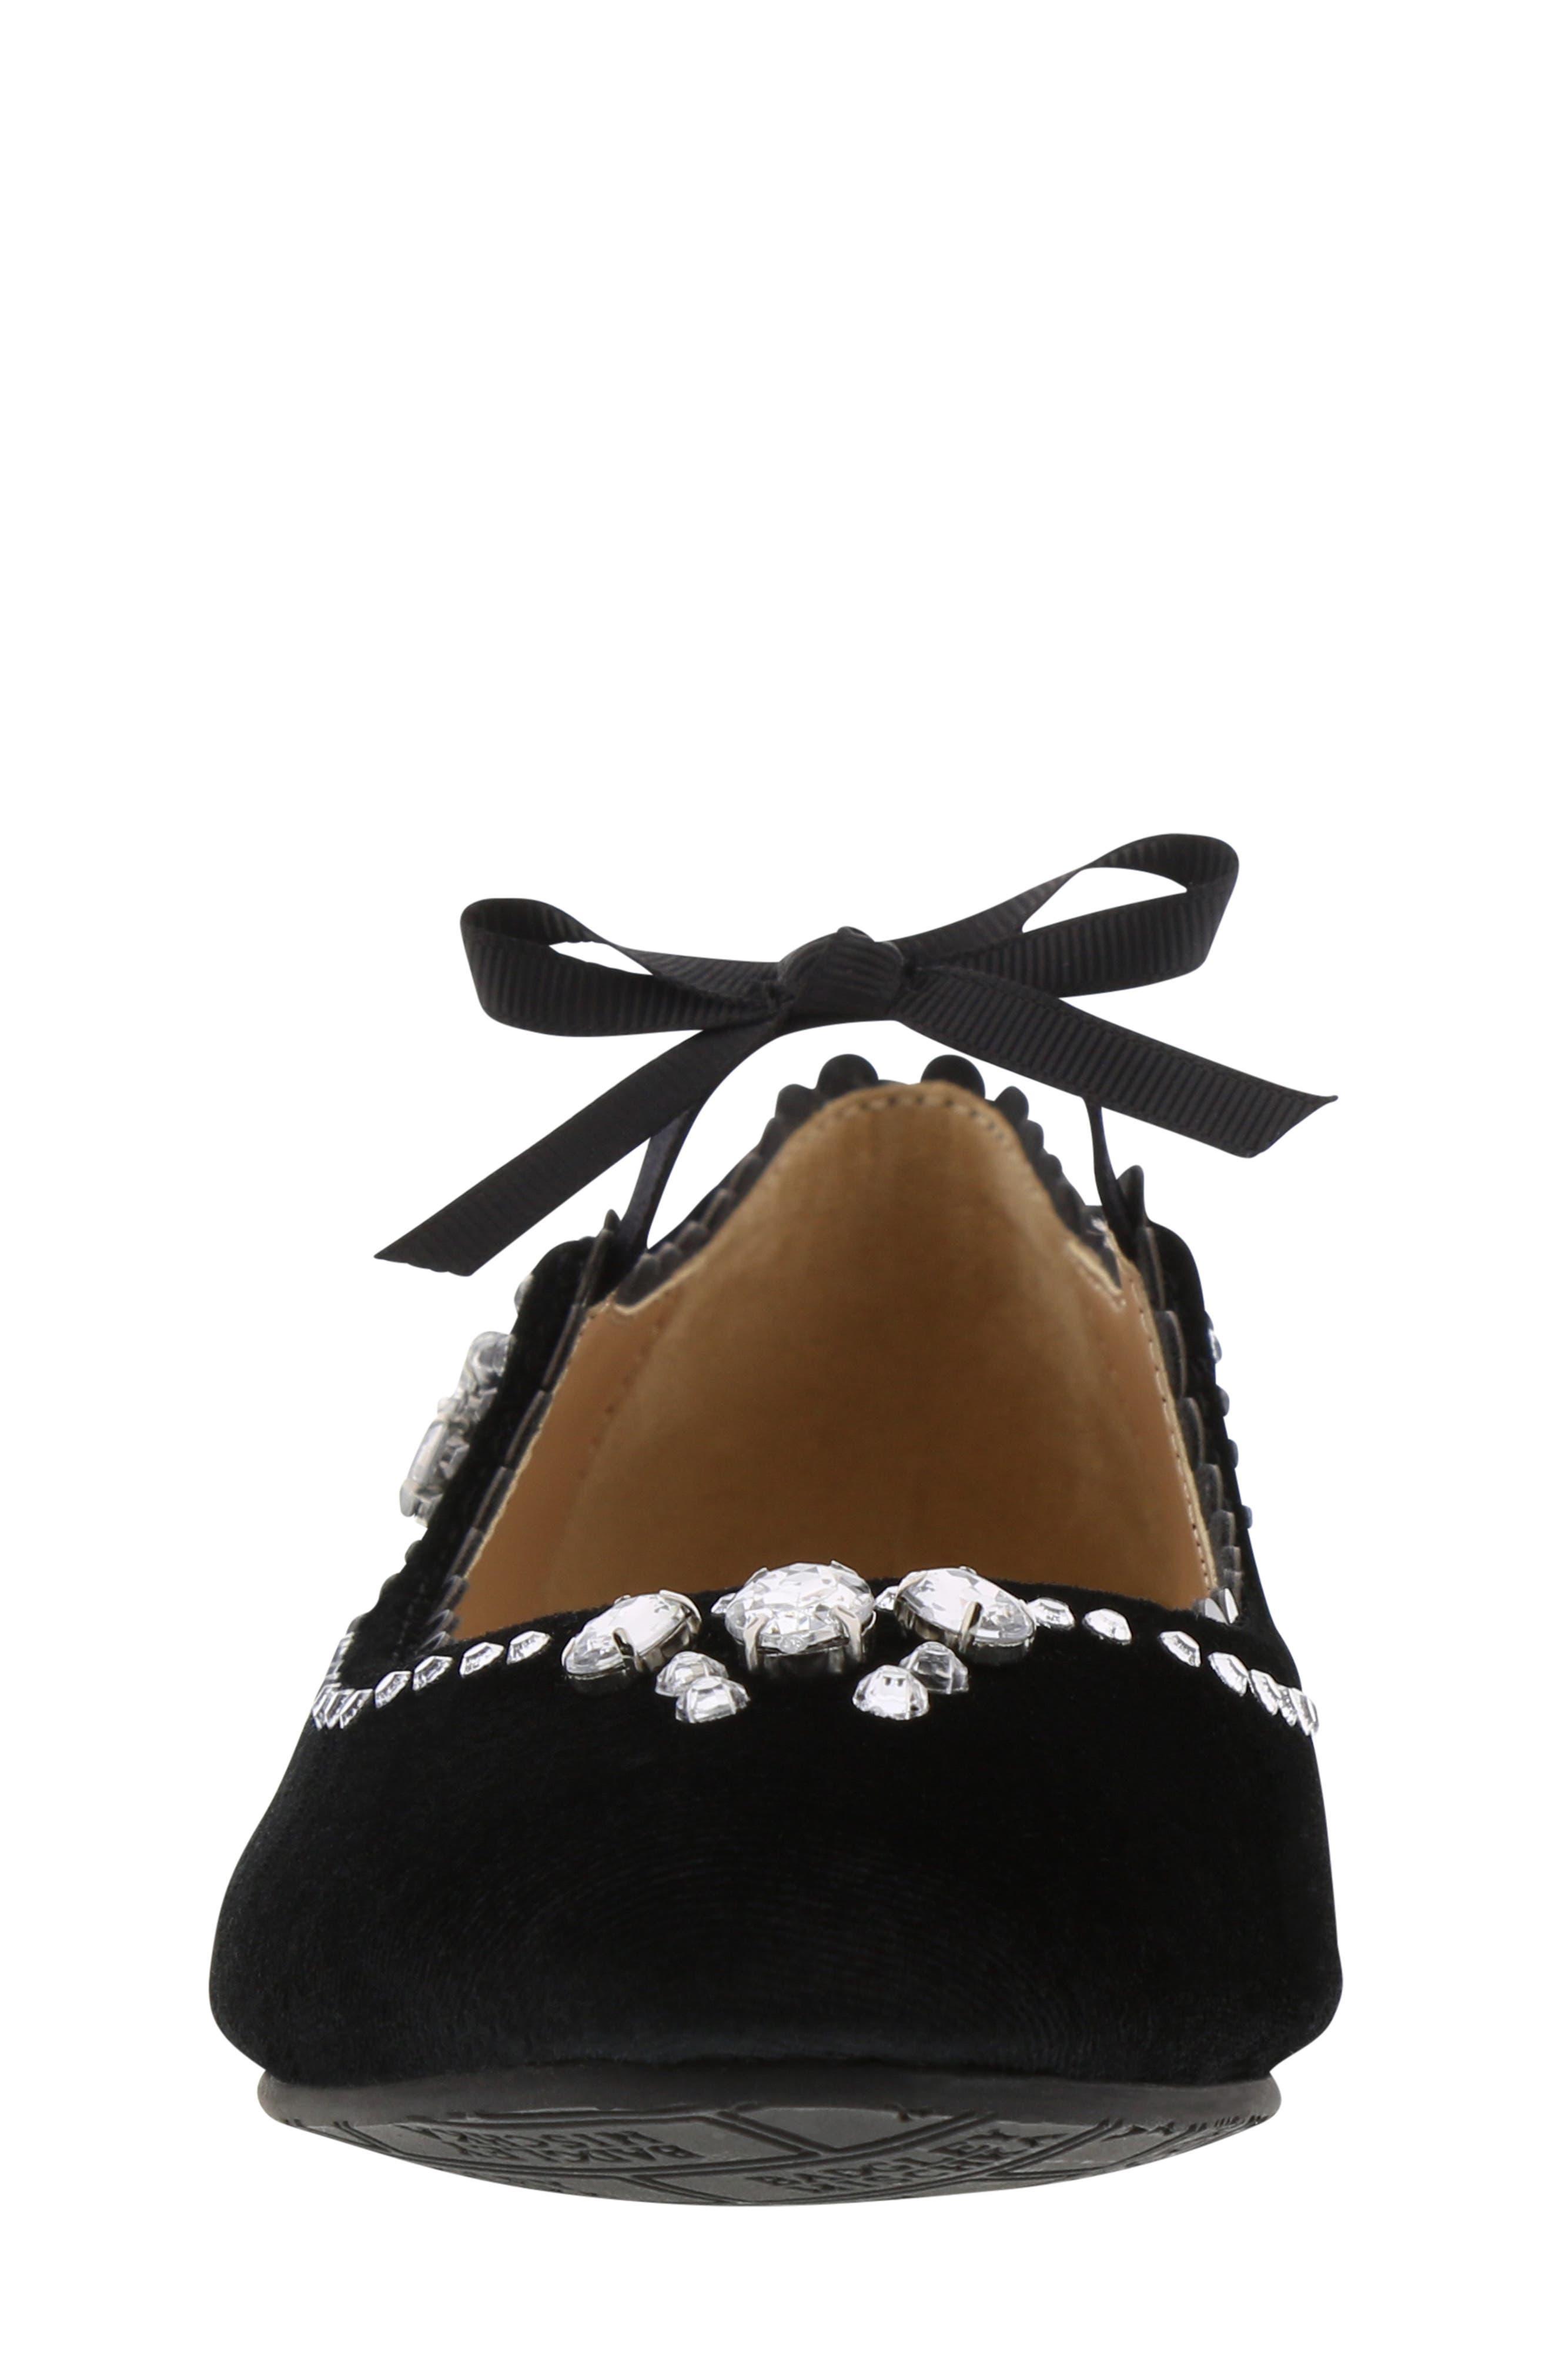 Badgley Mischka Amber Scallop Embellished Flat,                             Alternate thumbnail 4, color,                             BLACK